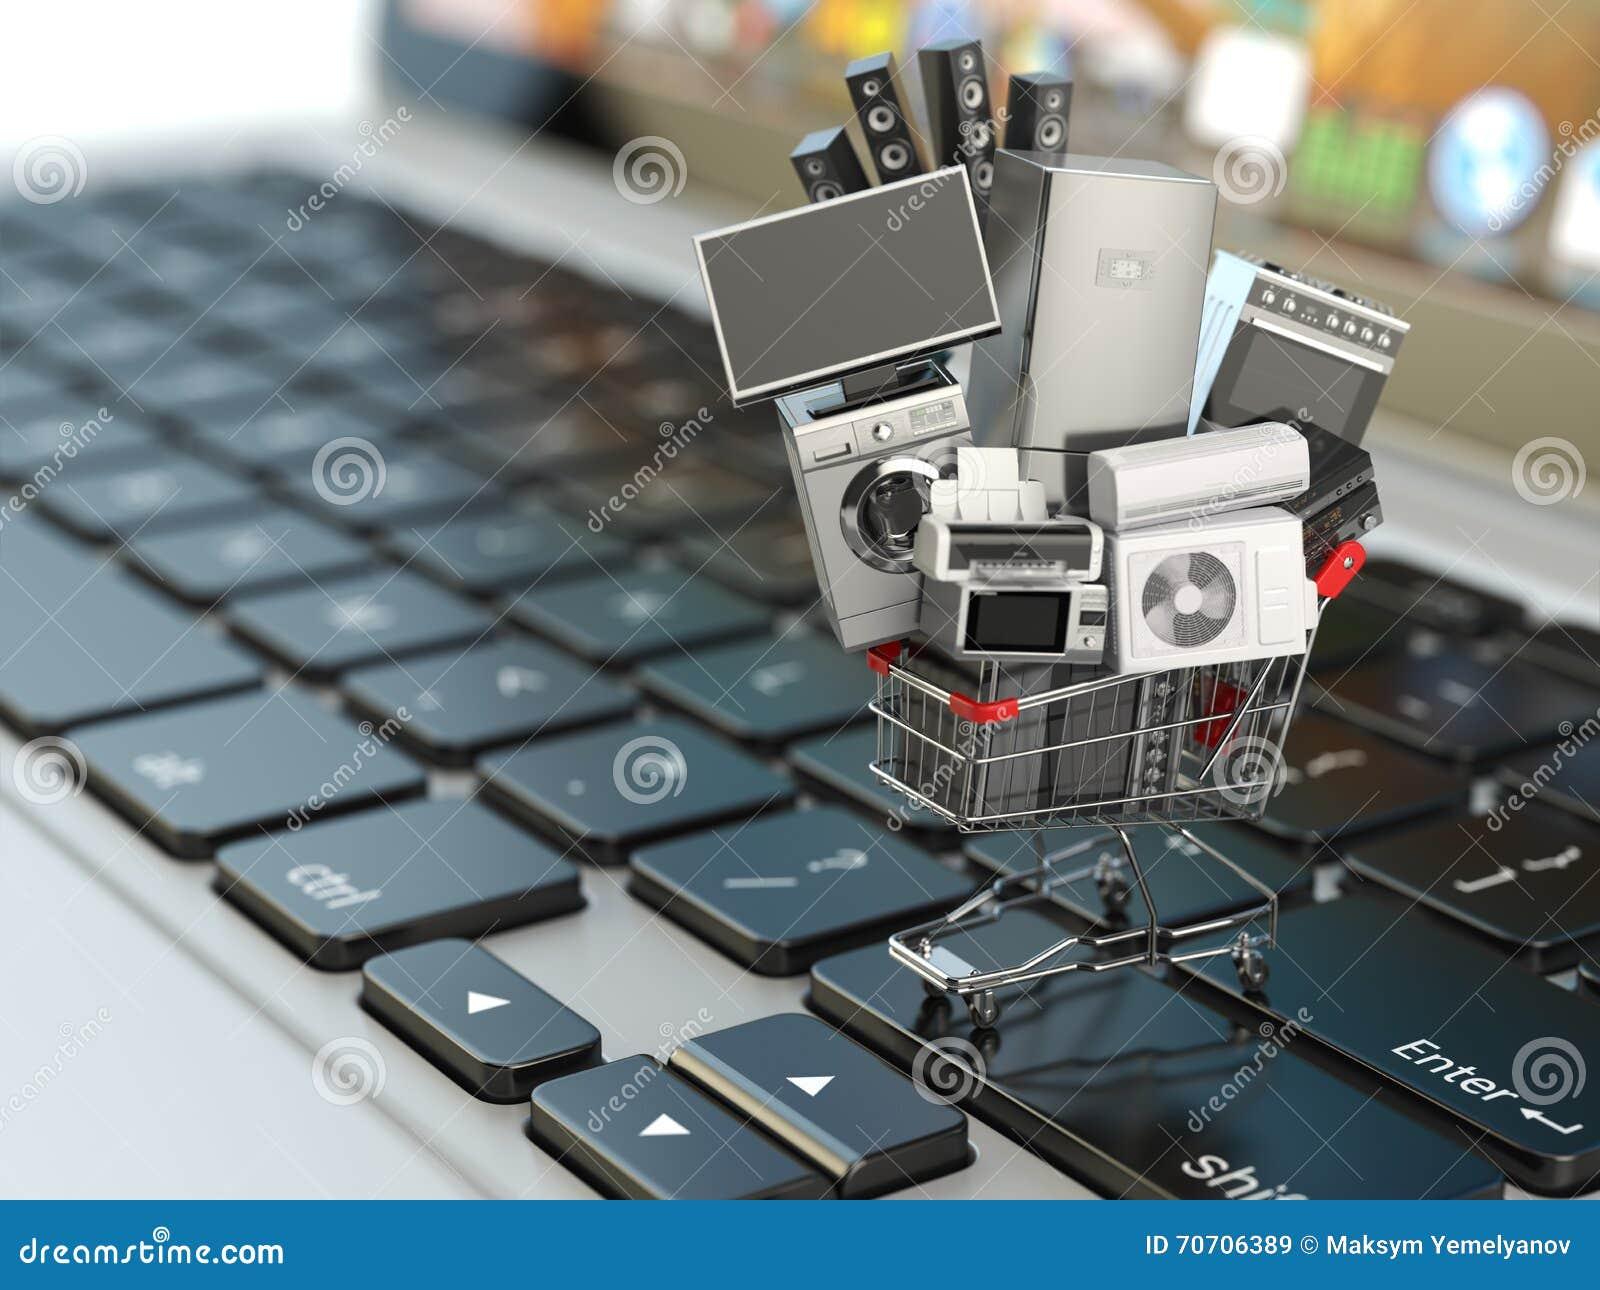 Online Kitchen Appliances Shopping | Kitchen Sohor